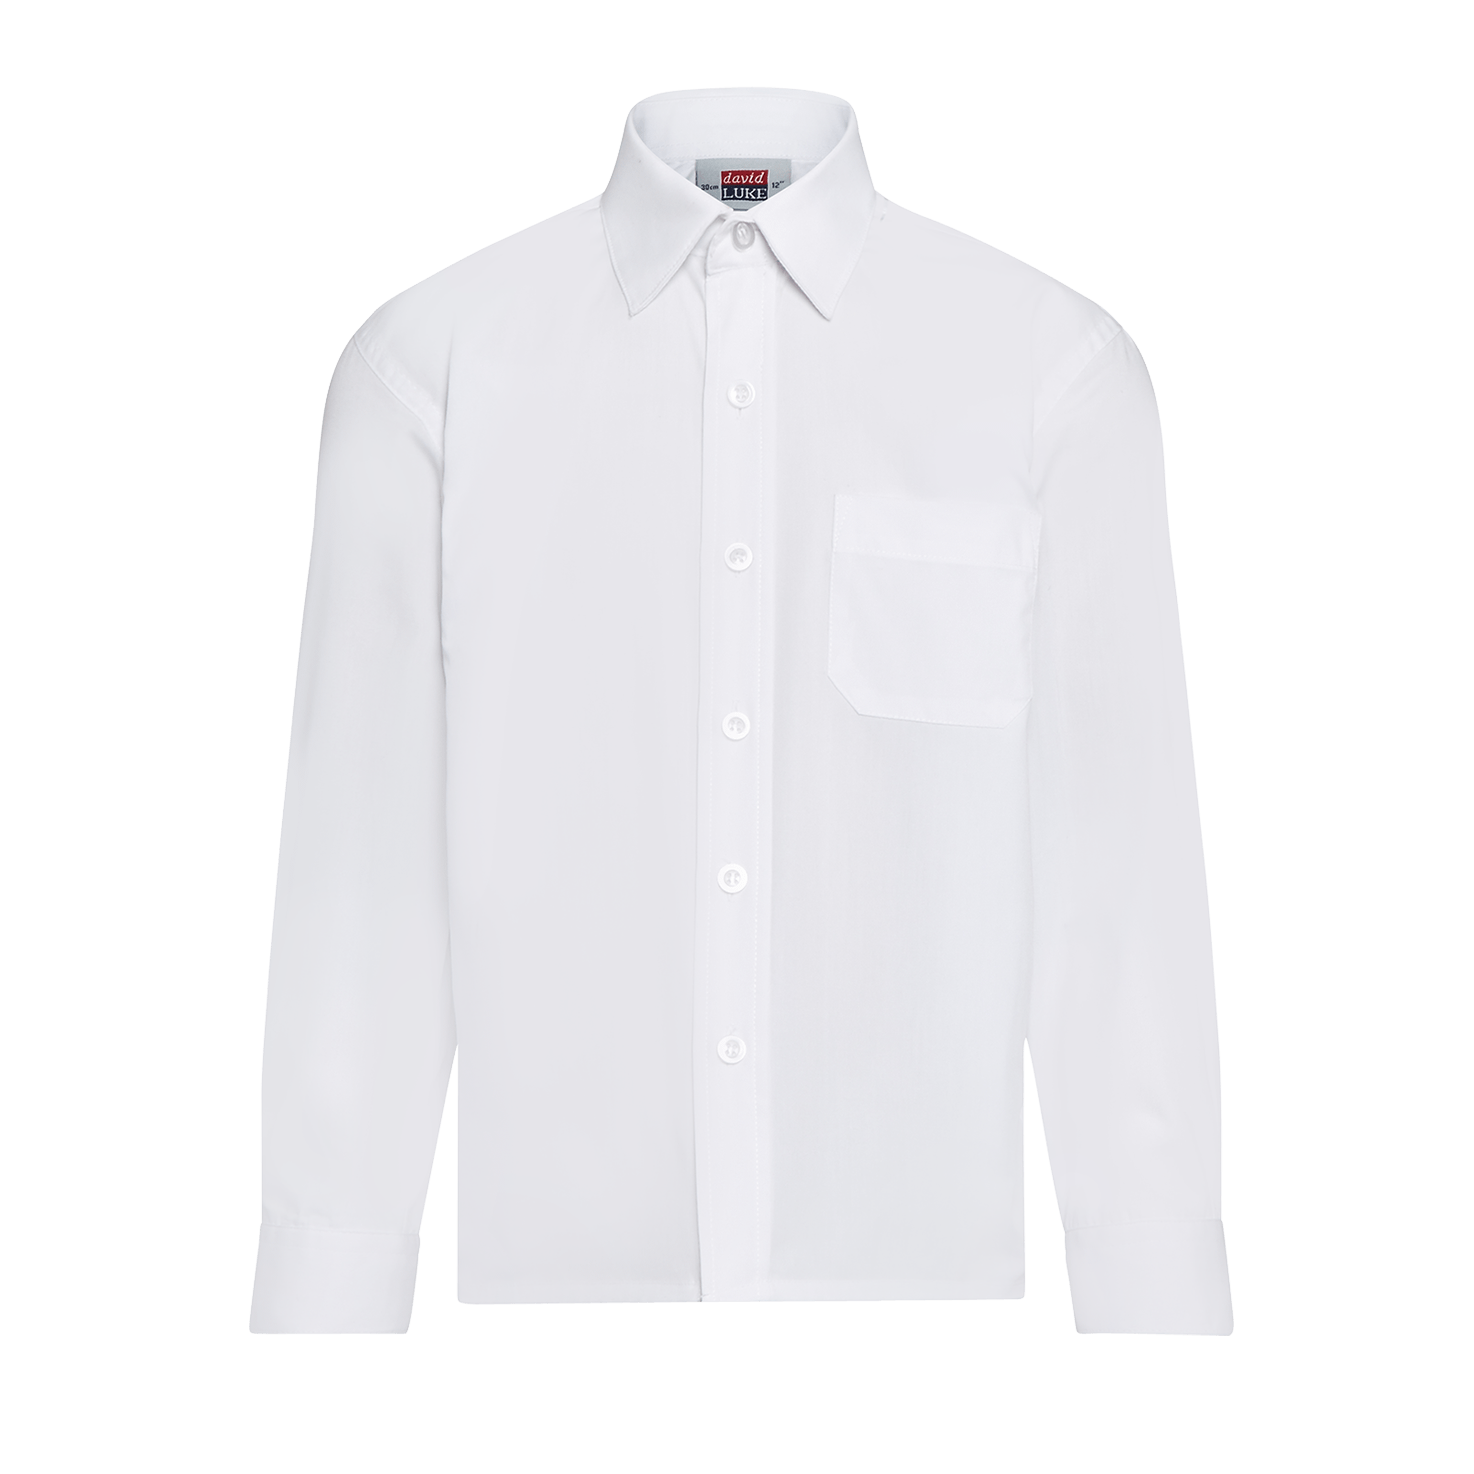 White School Shirt - Long Sleeve - Superstitch 86